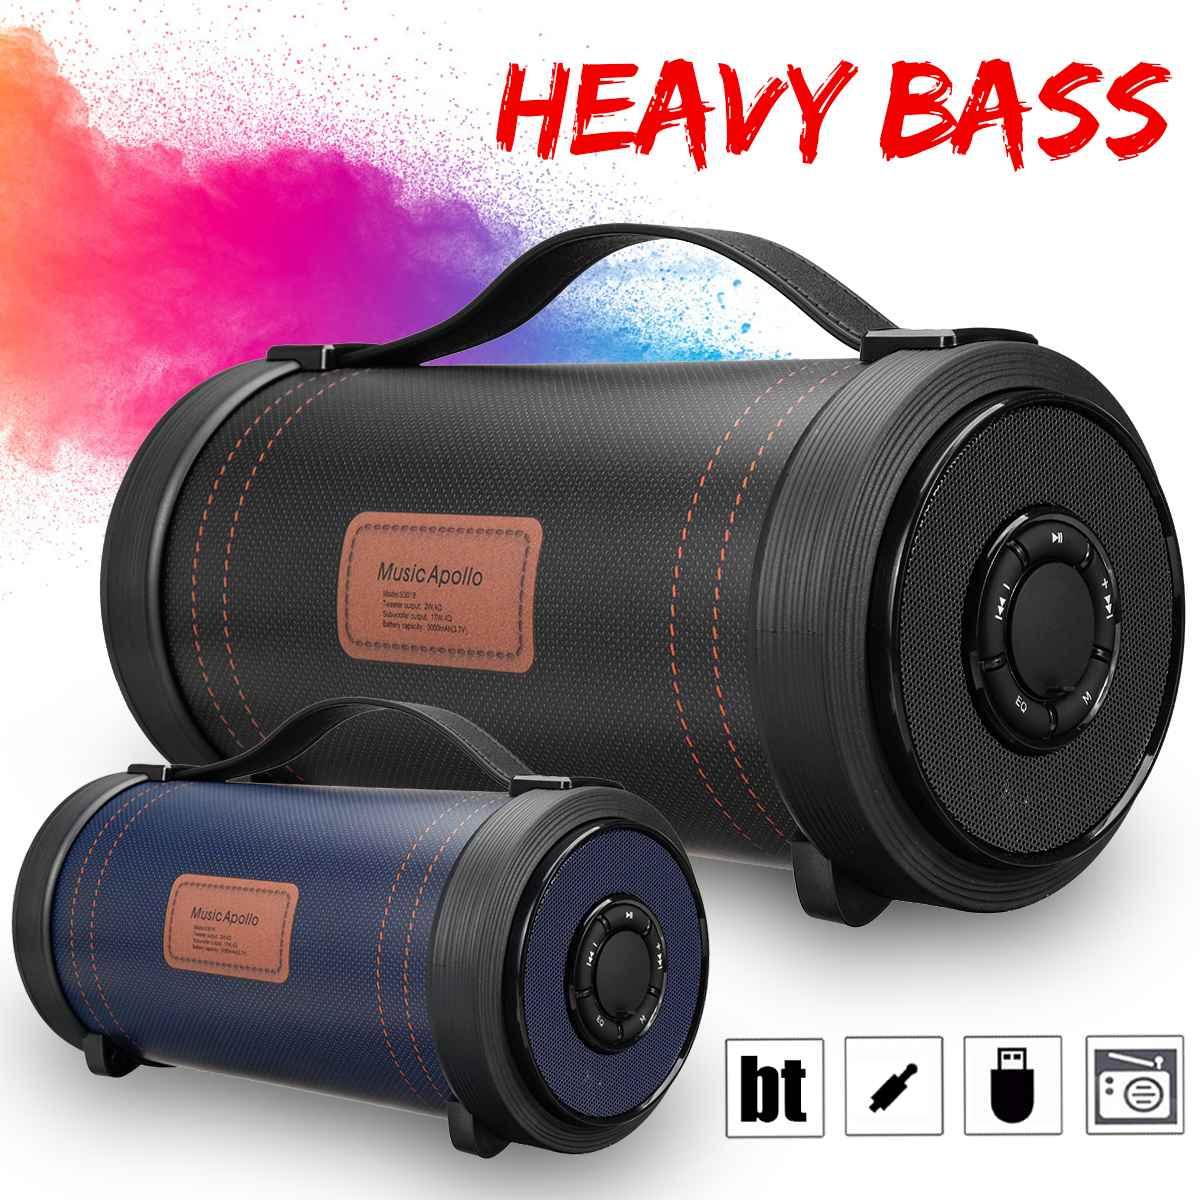 20W Wireless bluetooth Speaker Portable Outdoor Cylinder Speaker High Power Subwoofer Bass Music Sound Loudspeaker Stereo20W Wireless bluetooth Speaker Portable Outdoor Cylinder Speaker High Power Subwoofer Bass Music Sound Loudspeaker Stereo